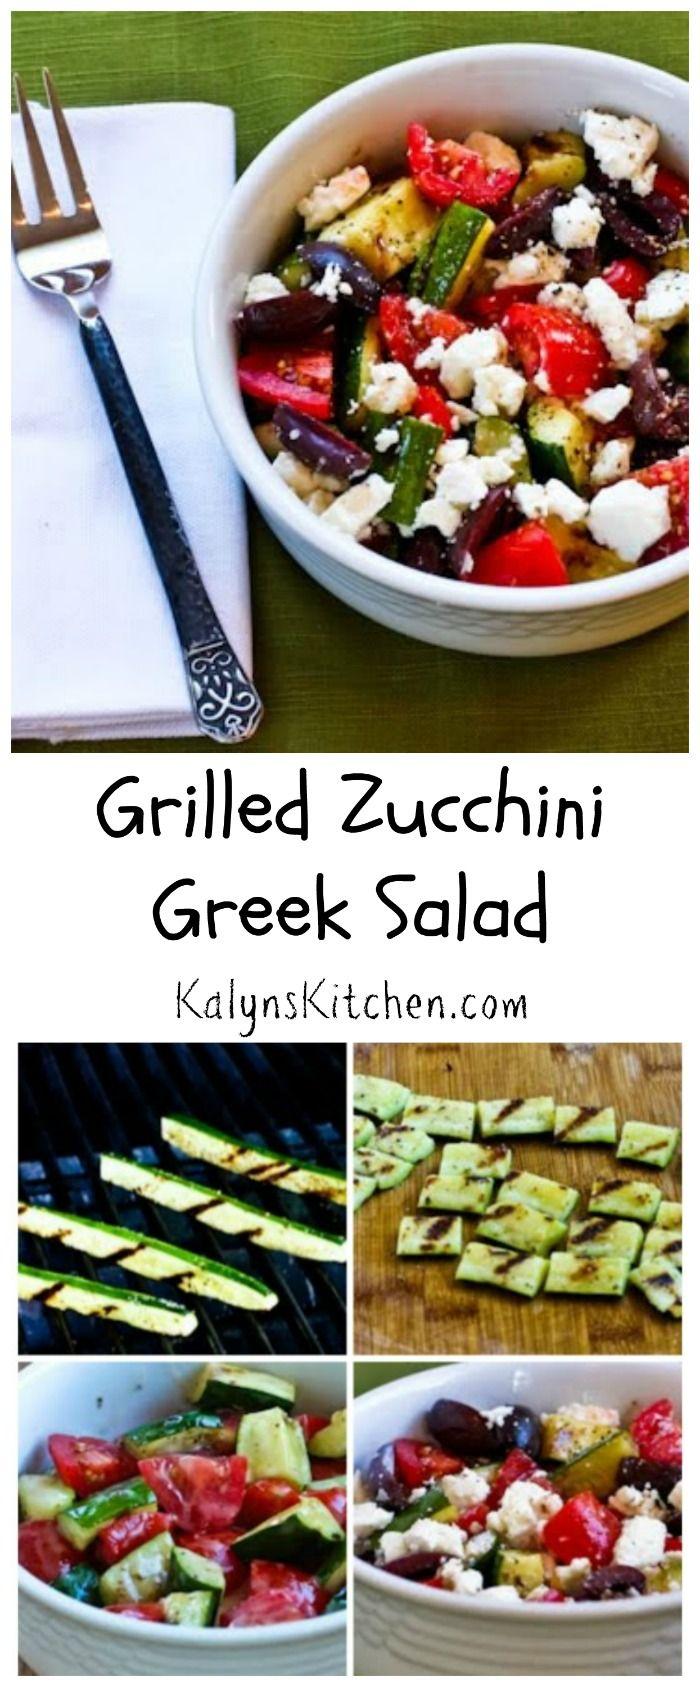 14 best ideas about Salads on Pinterest | Greek salad ...